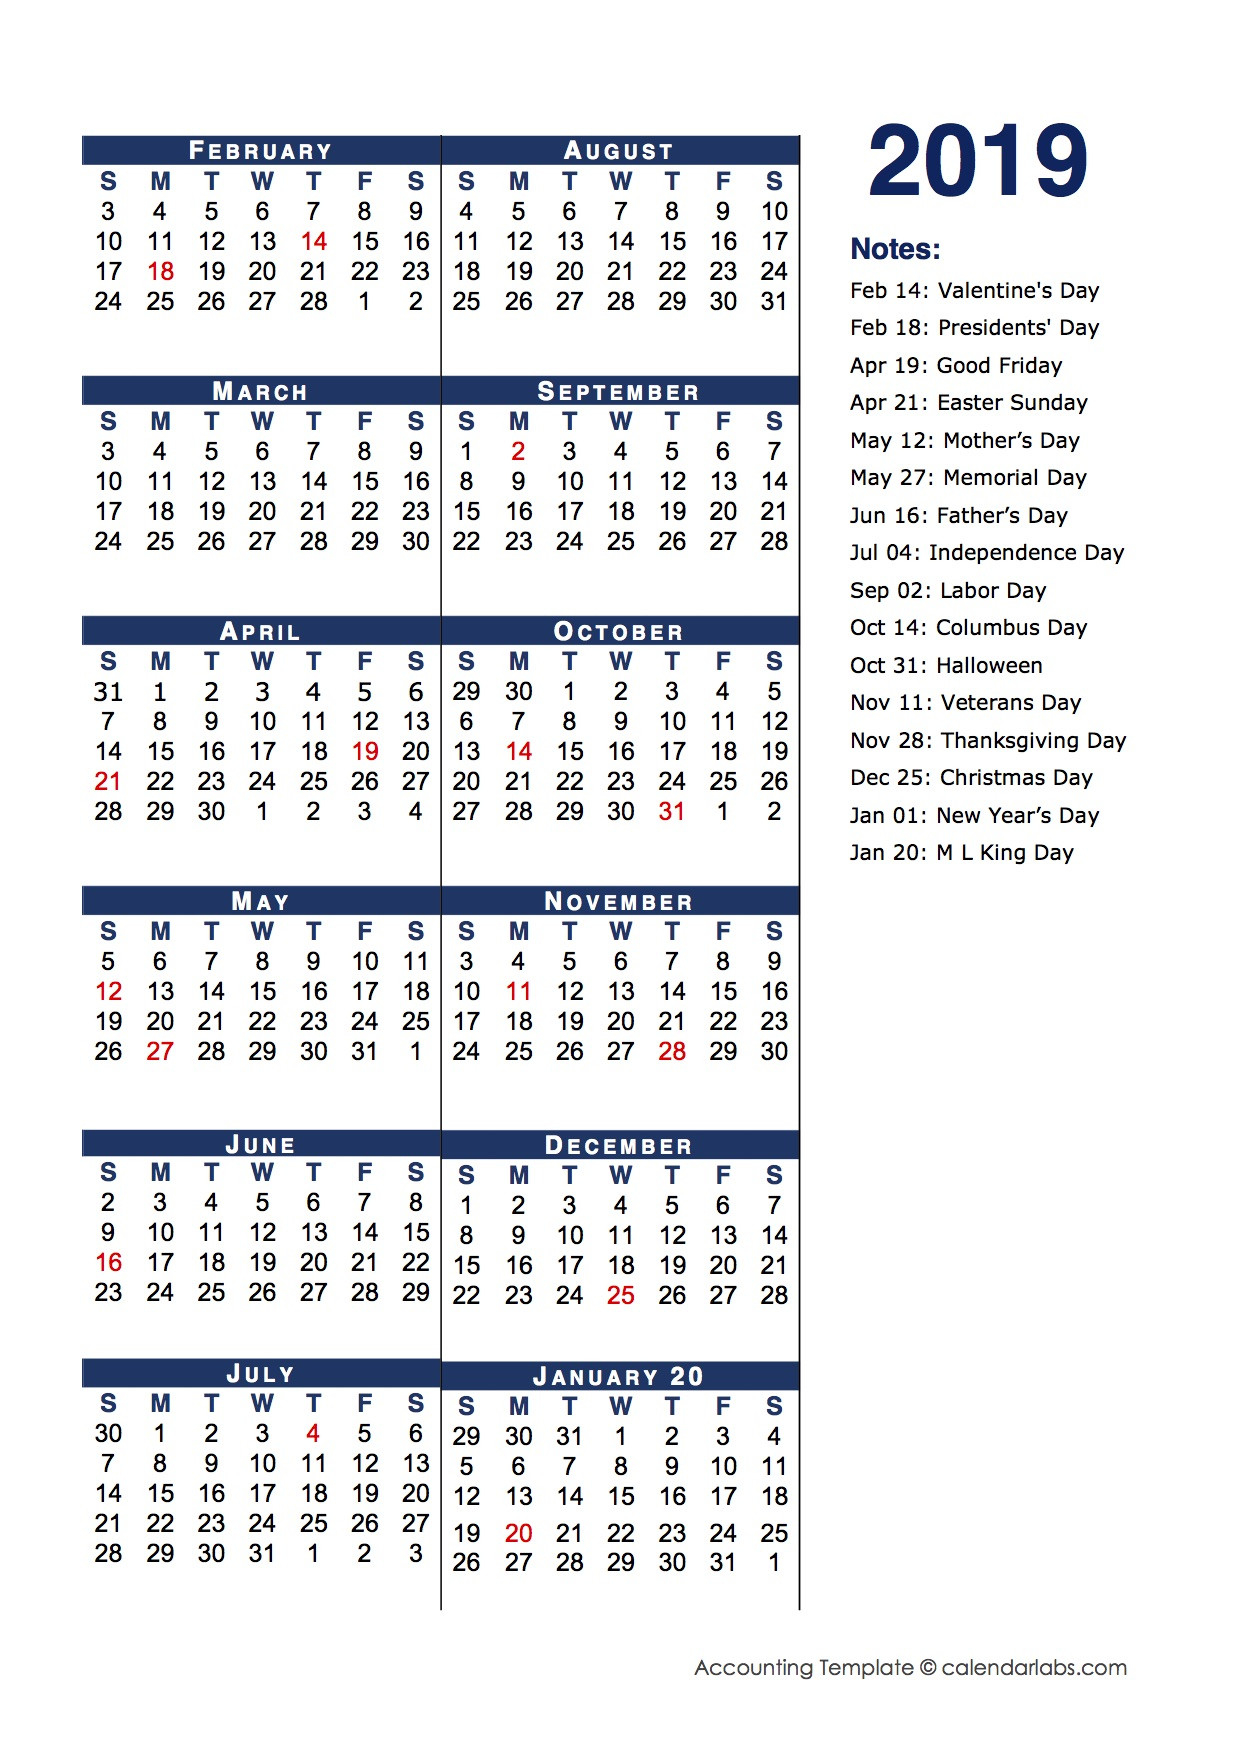 2019 Fiscal Period Calendar 4-4-5 - Free Printable Templates  Aus 2021-2021 Financial Year Period